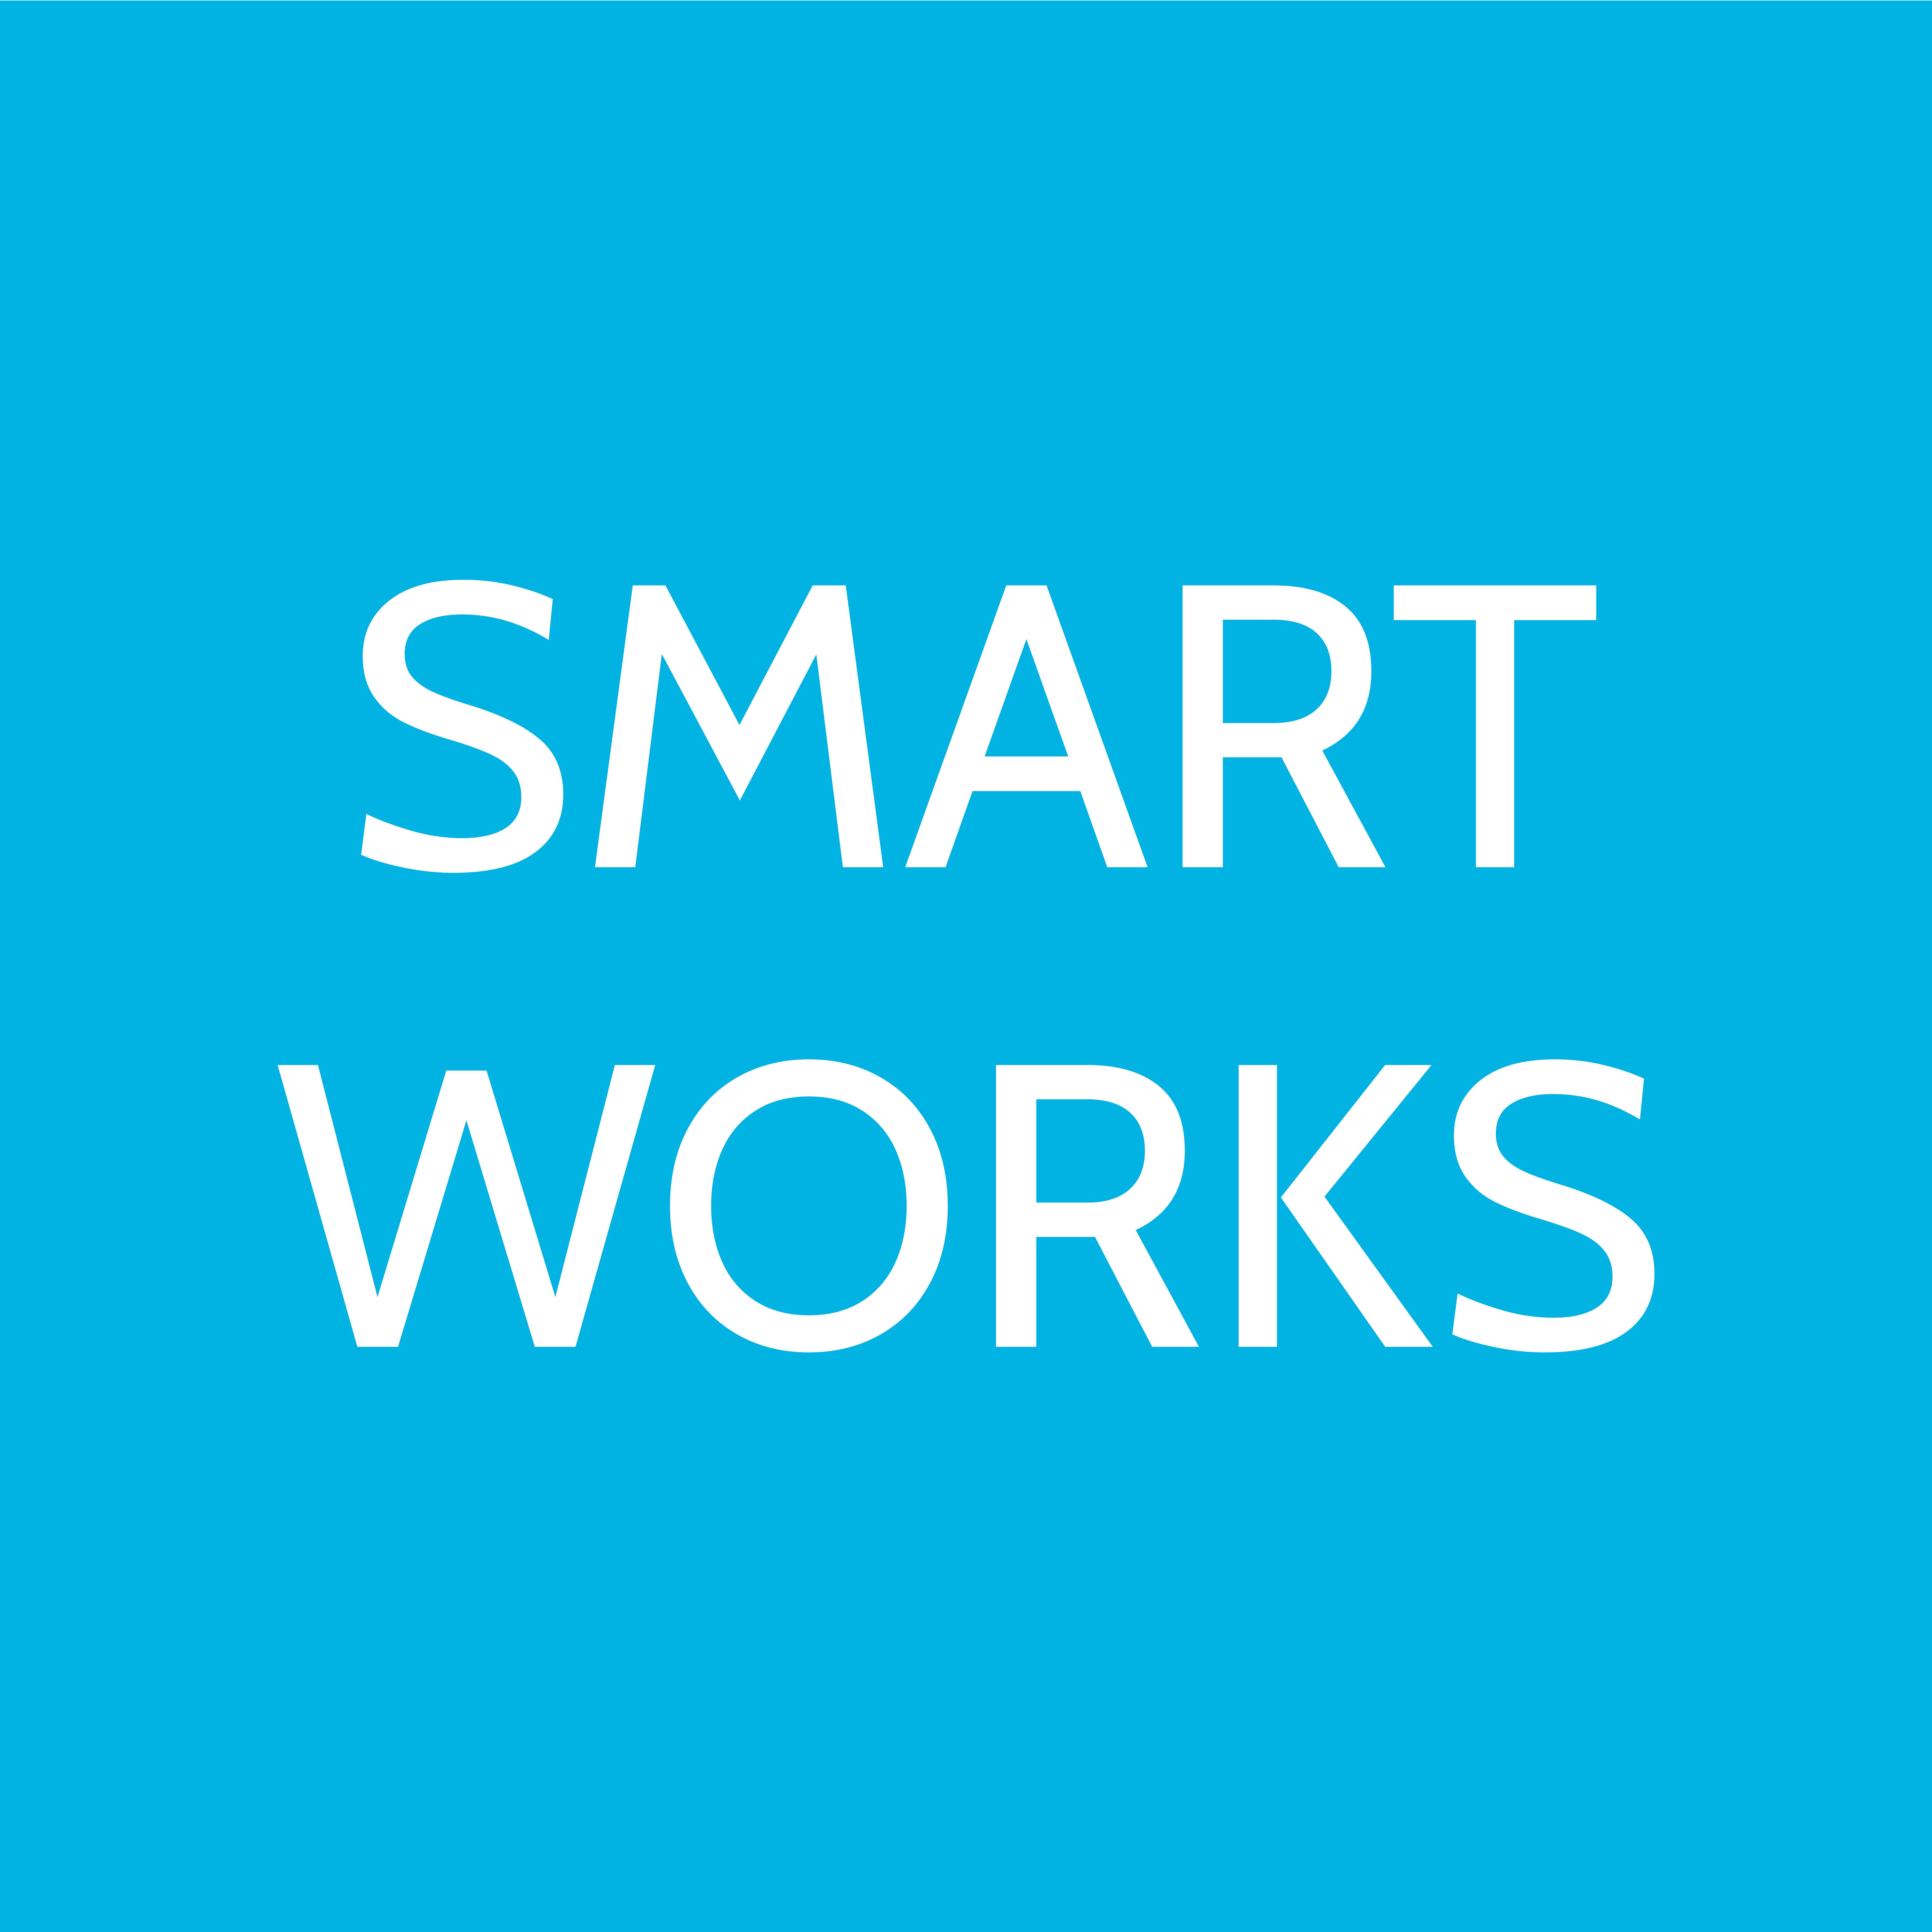 Smart Works